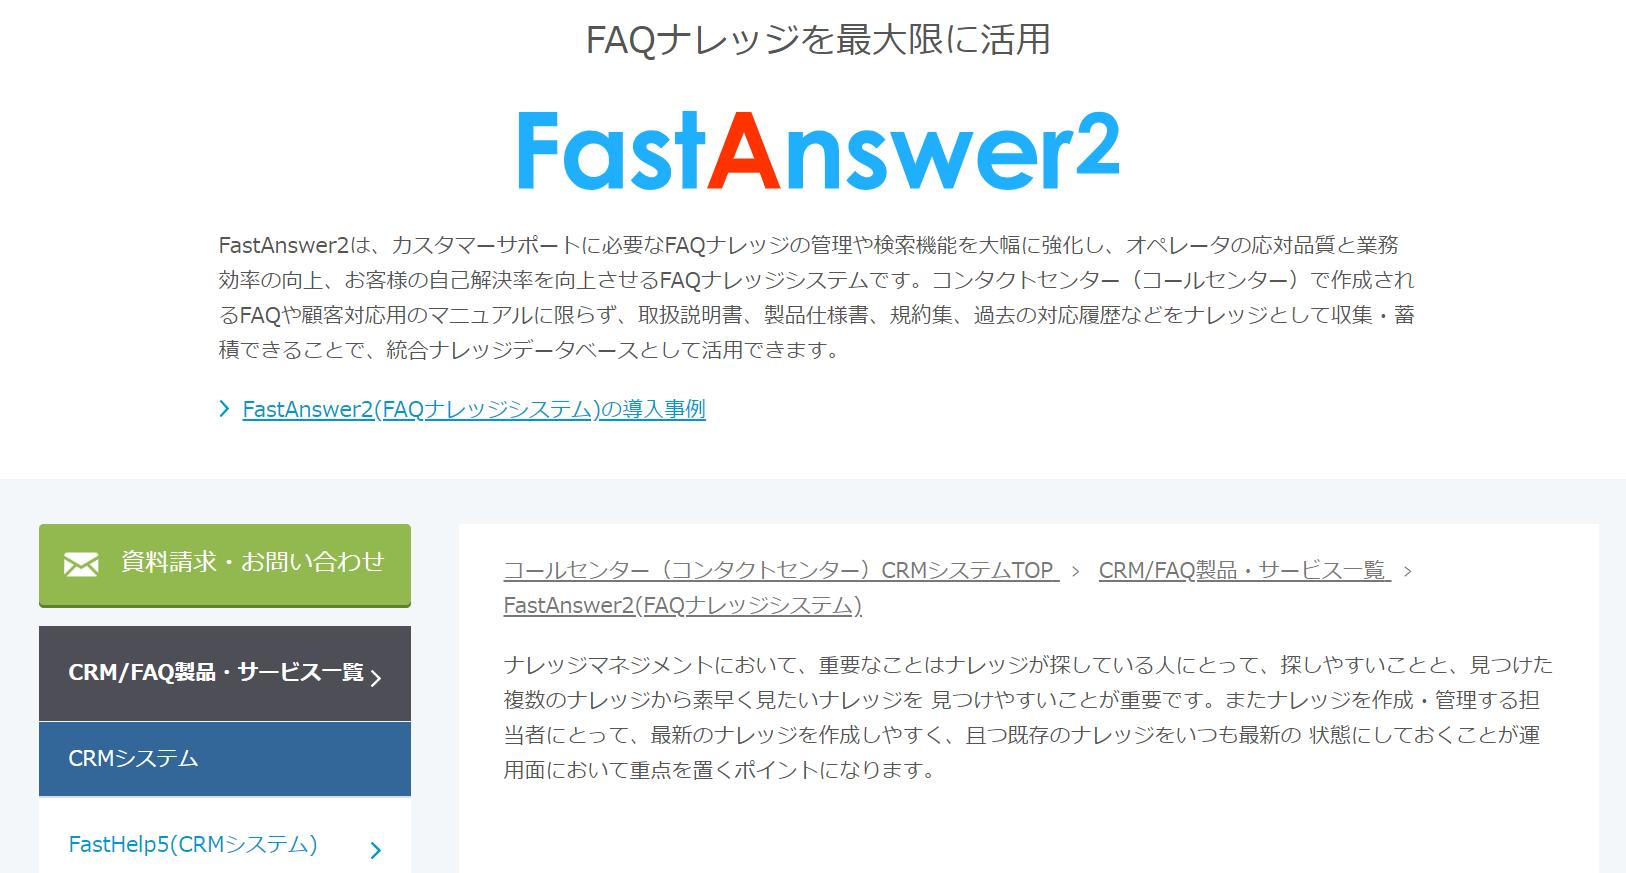 FastAnswer2 サービス紹介サイト